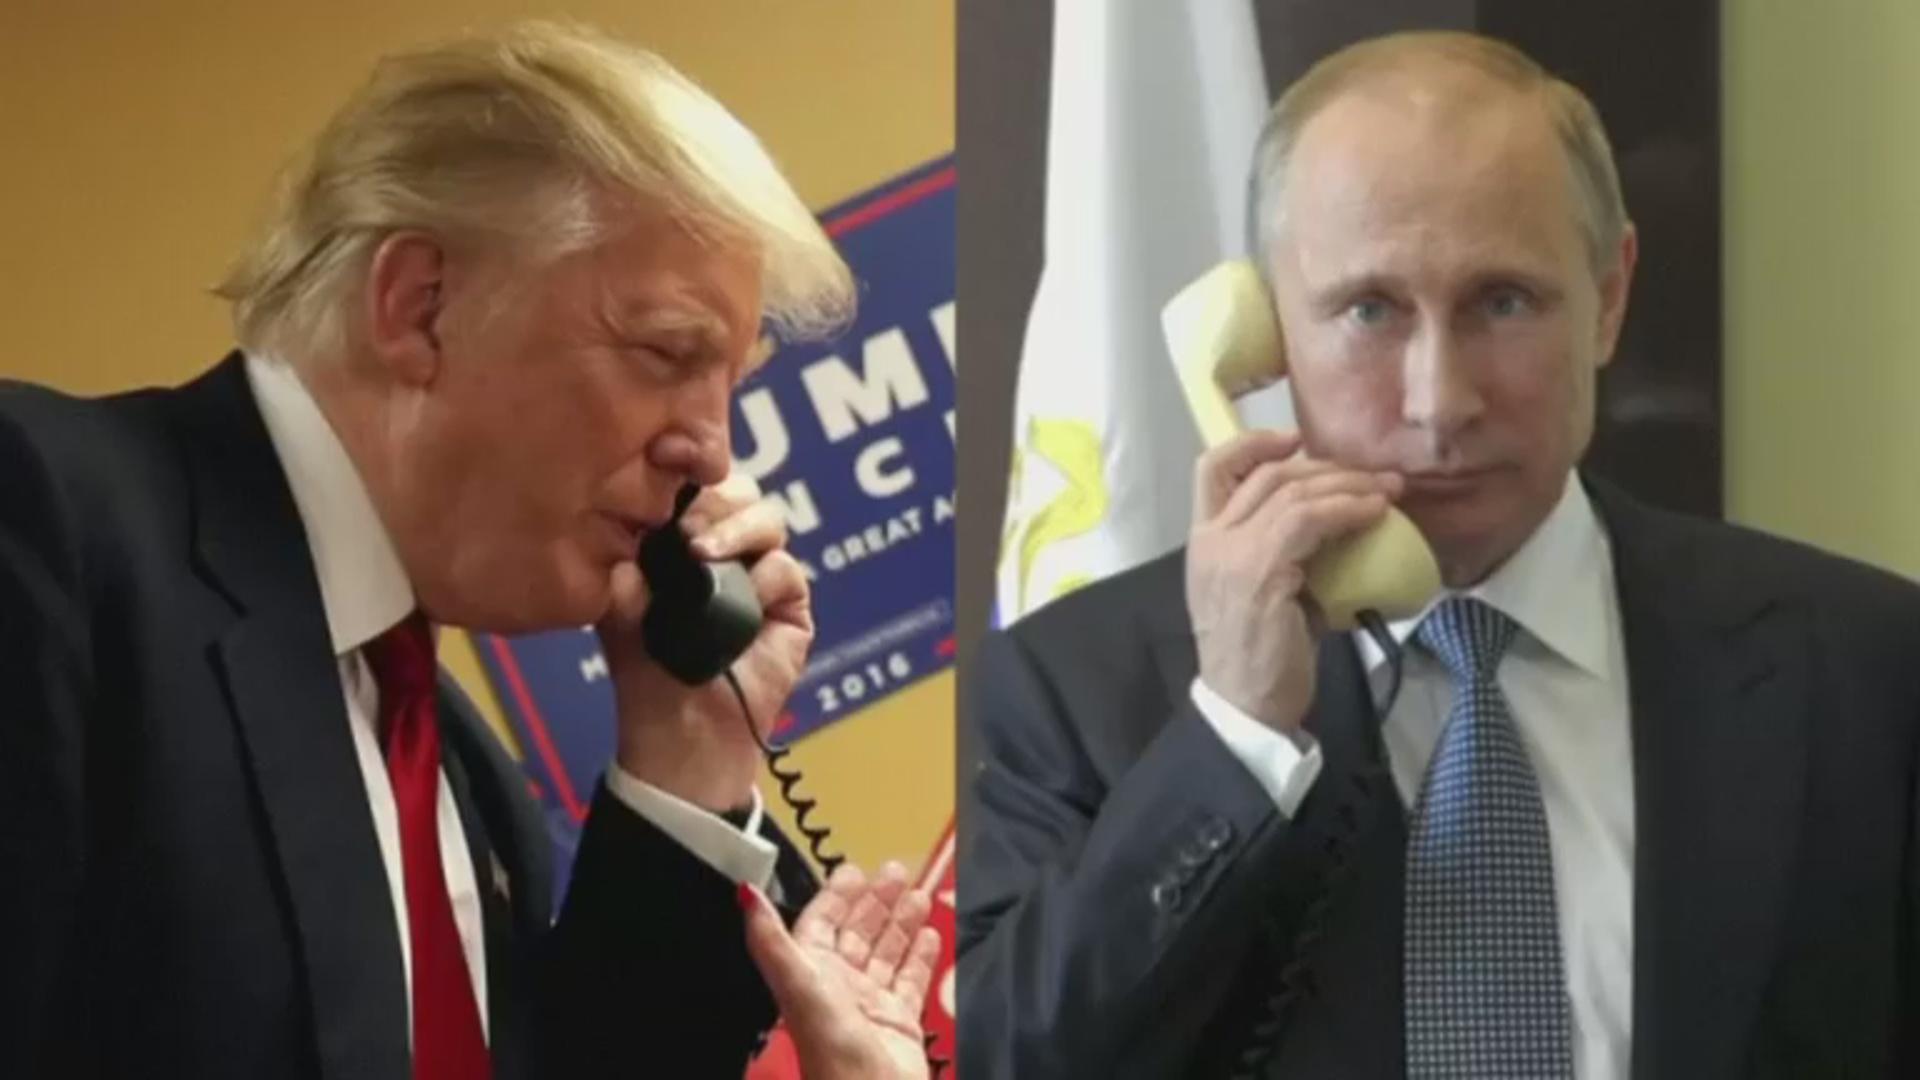 President Trump calls Russia's Vladimir Putin